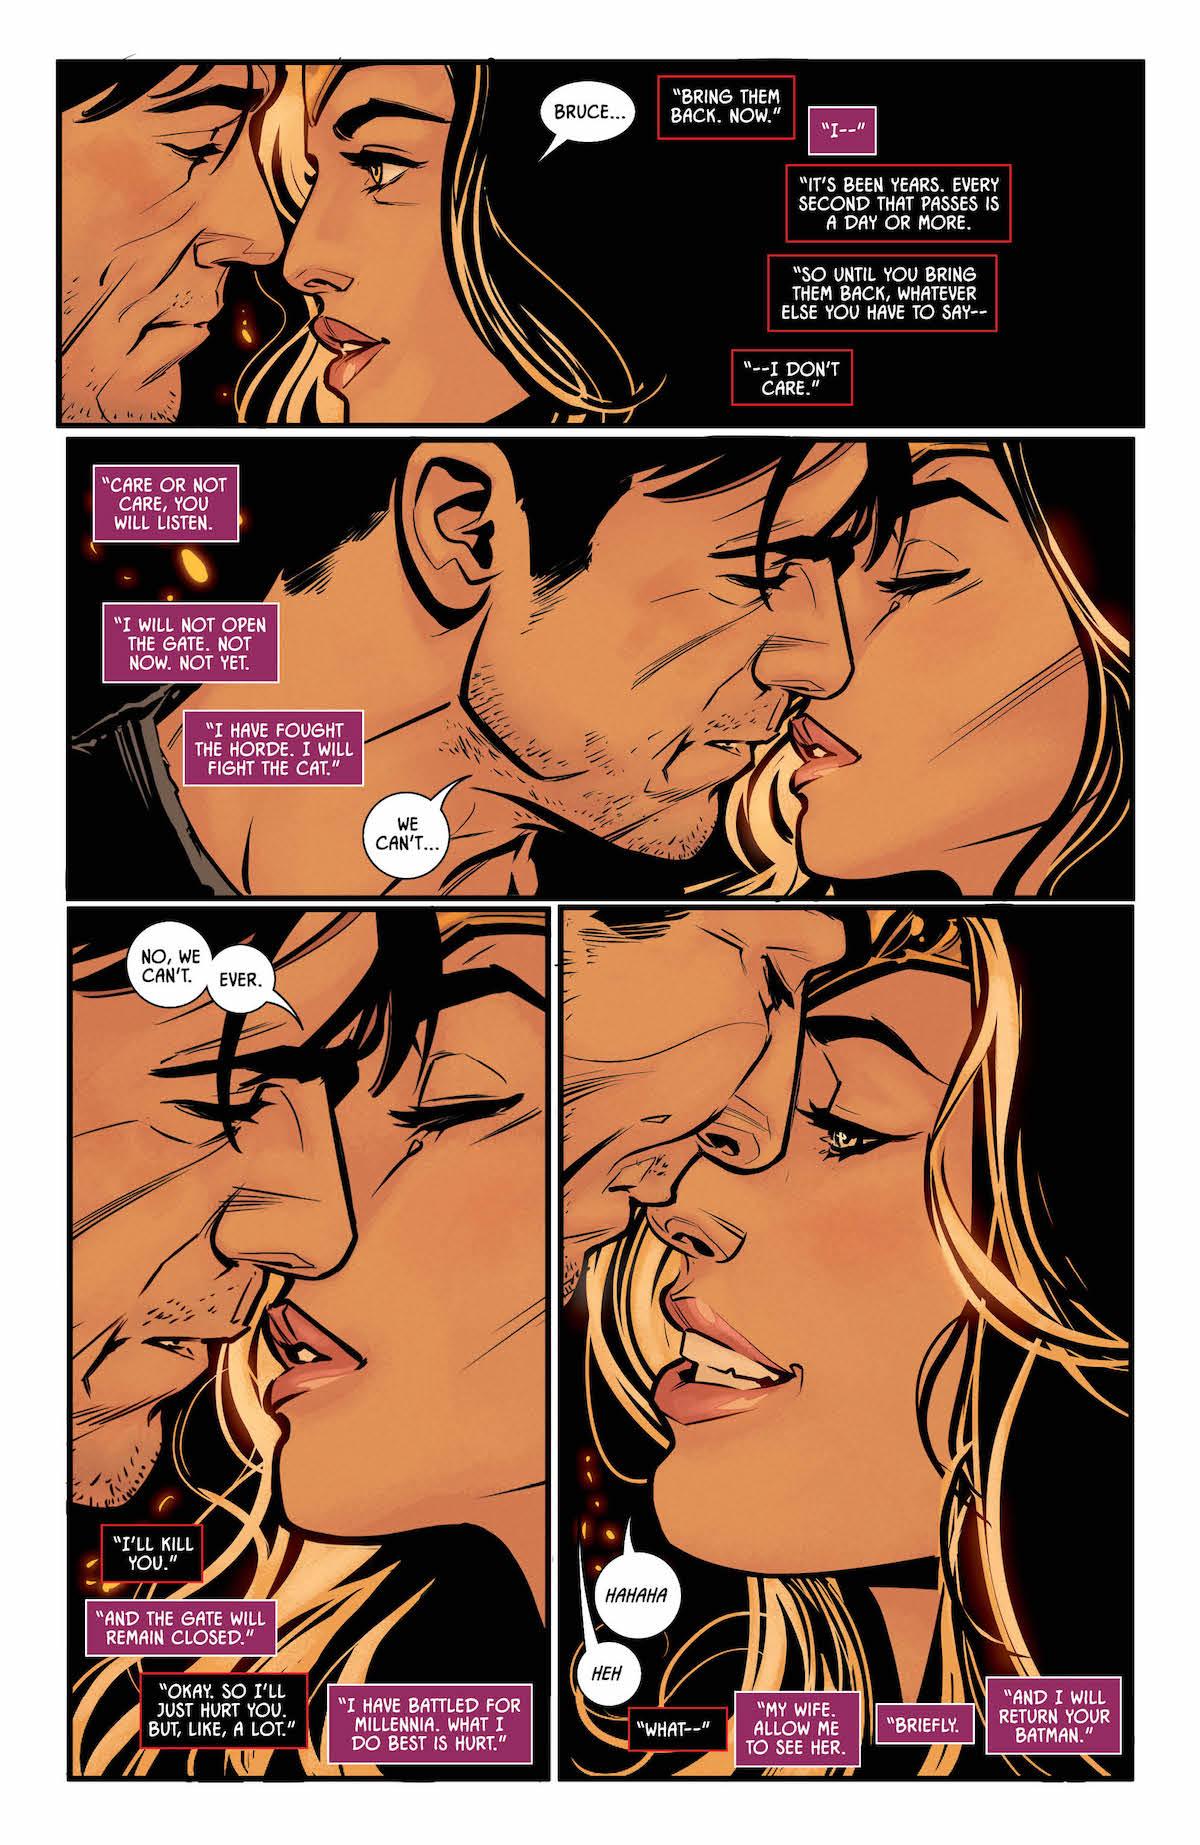 Batman #40 page 4 Wonder Woman and Bruce